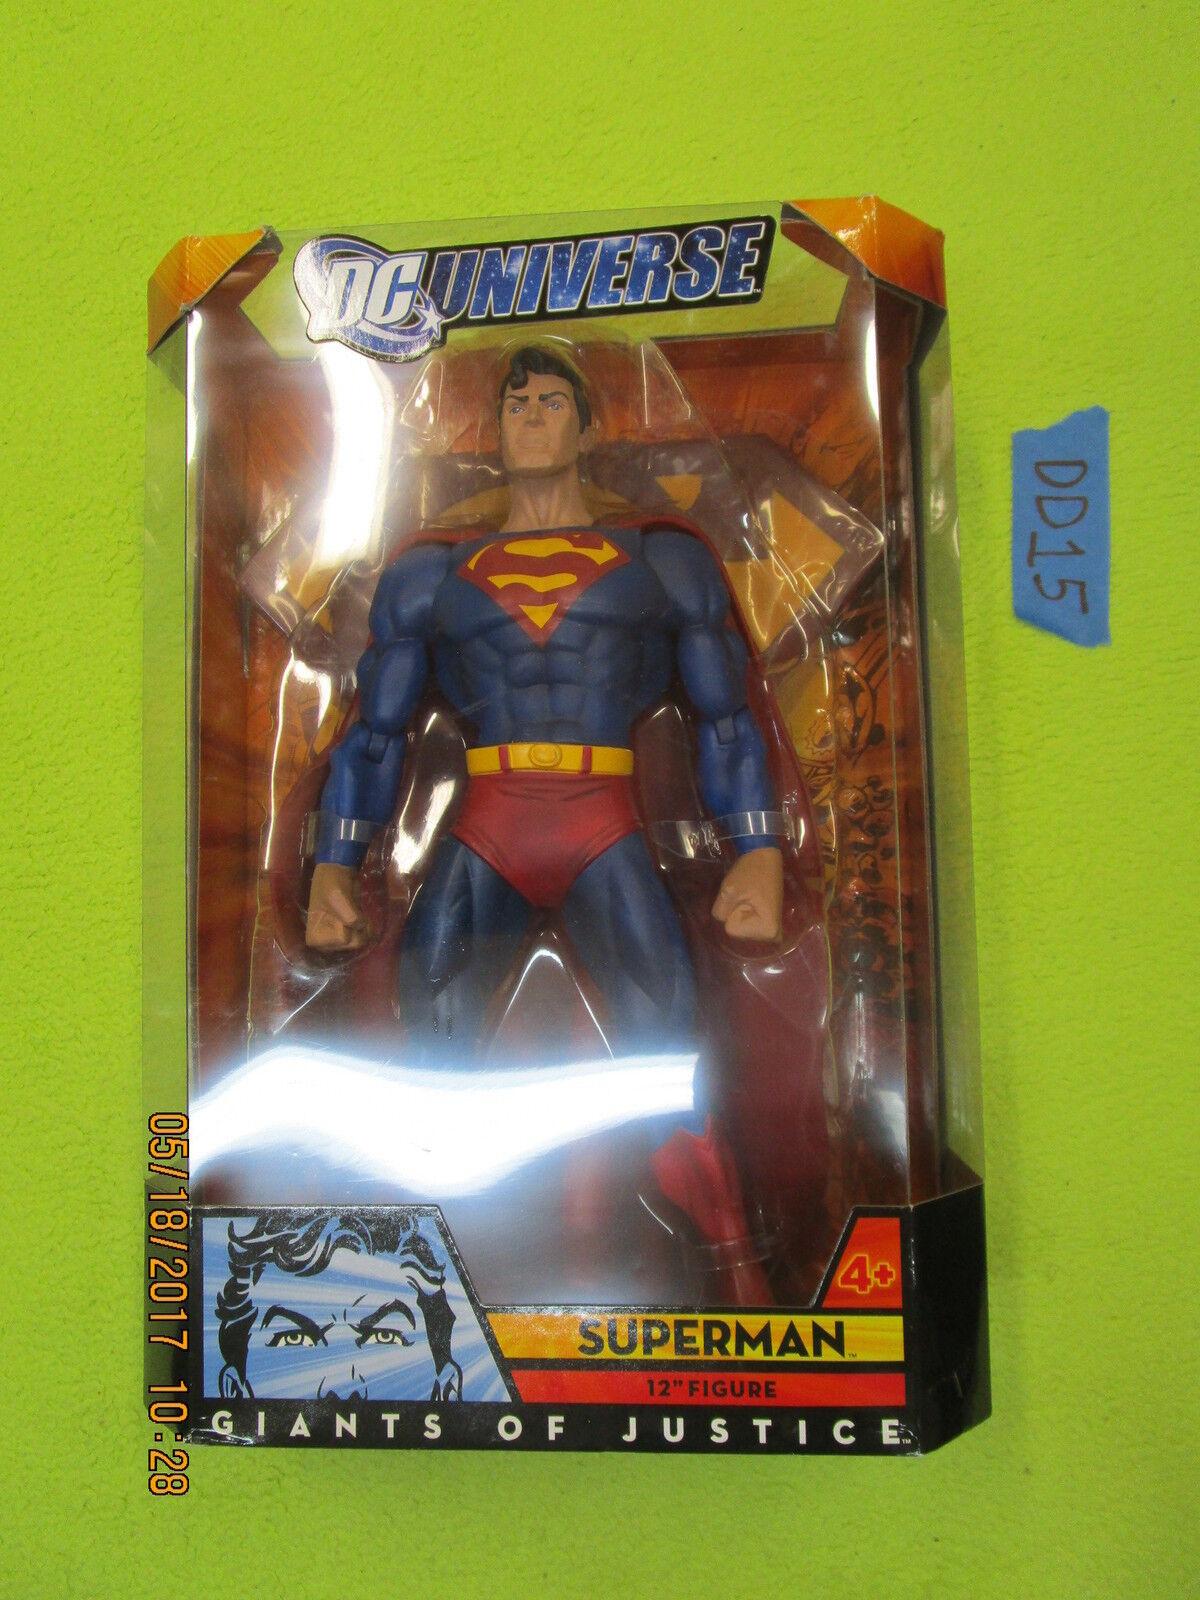 DD15_5 DC Universe Classics Lot GIANTS OF JUSTICE SUPERMAN 12  FIGURE MISB dcuc